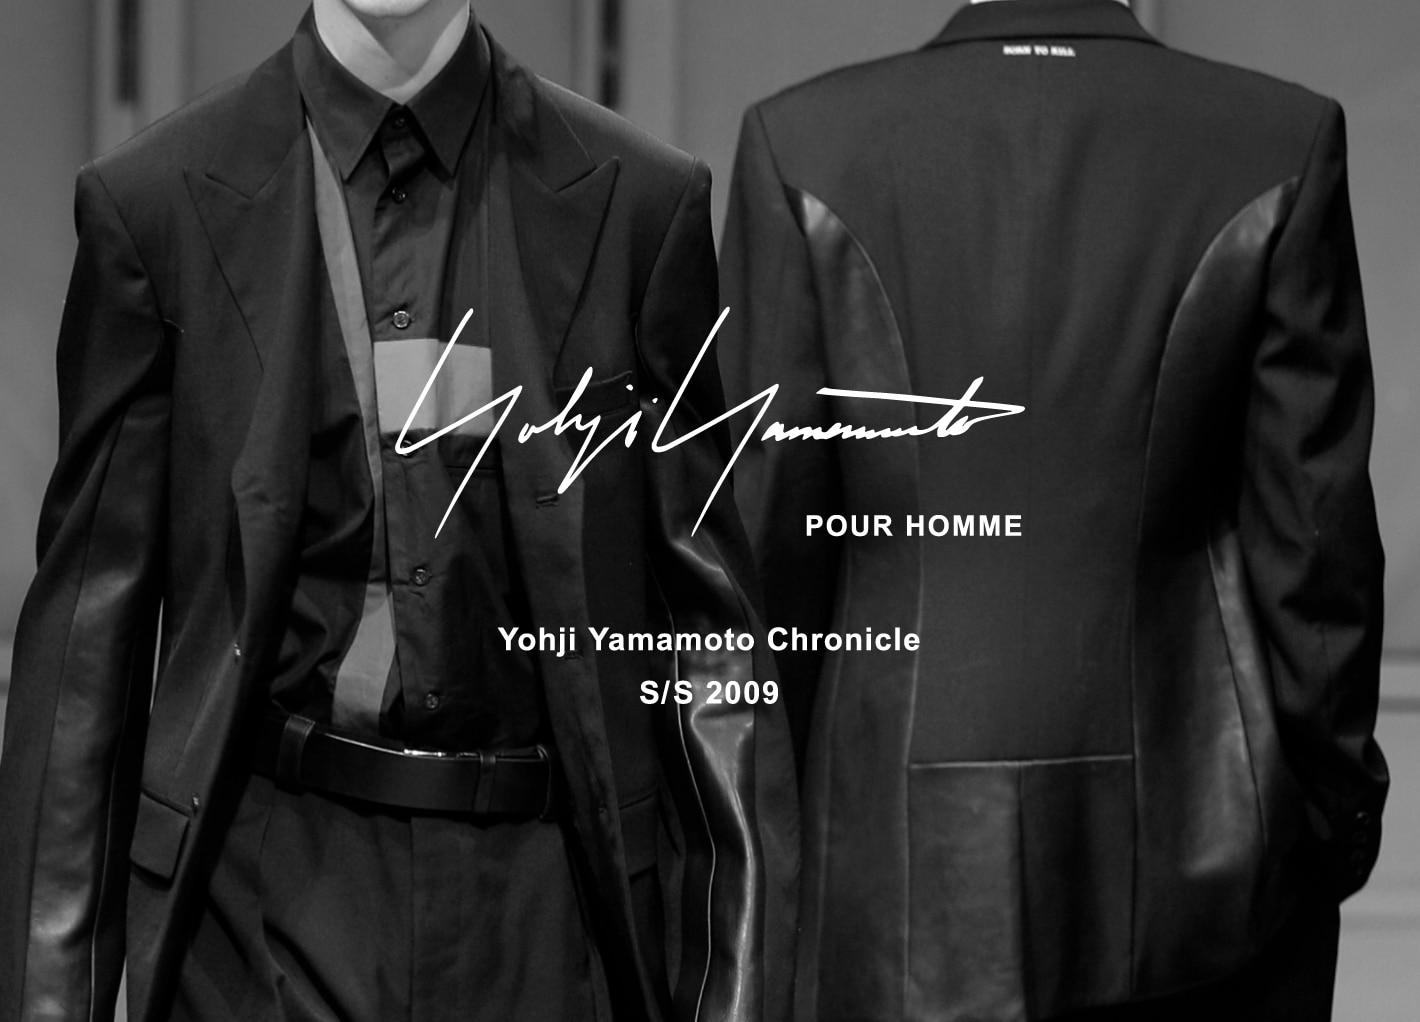 Yohji Yamamoto Chronicle – POUR HOMME SS 2009